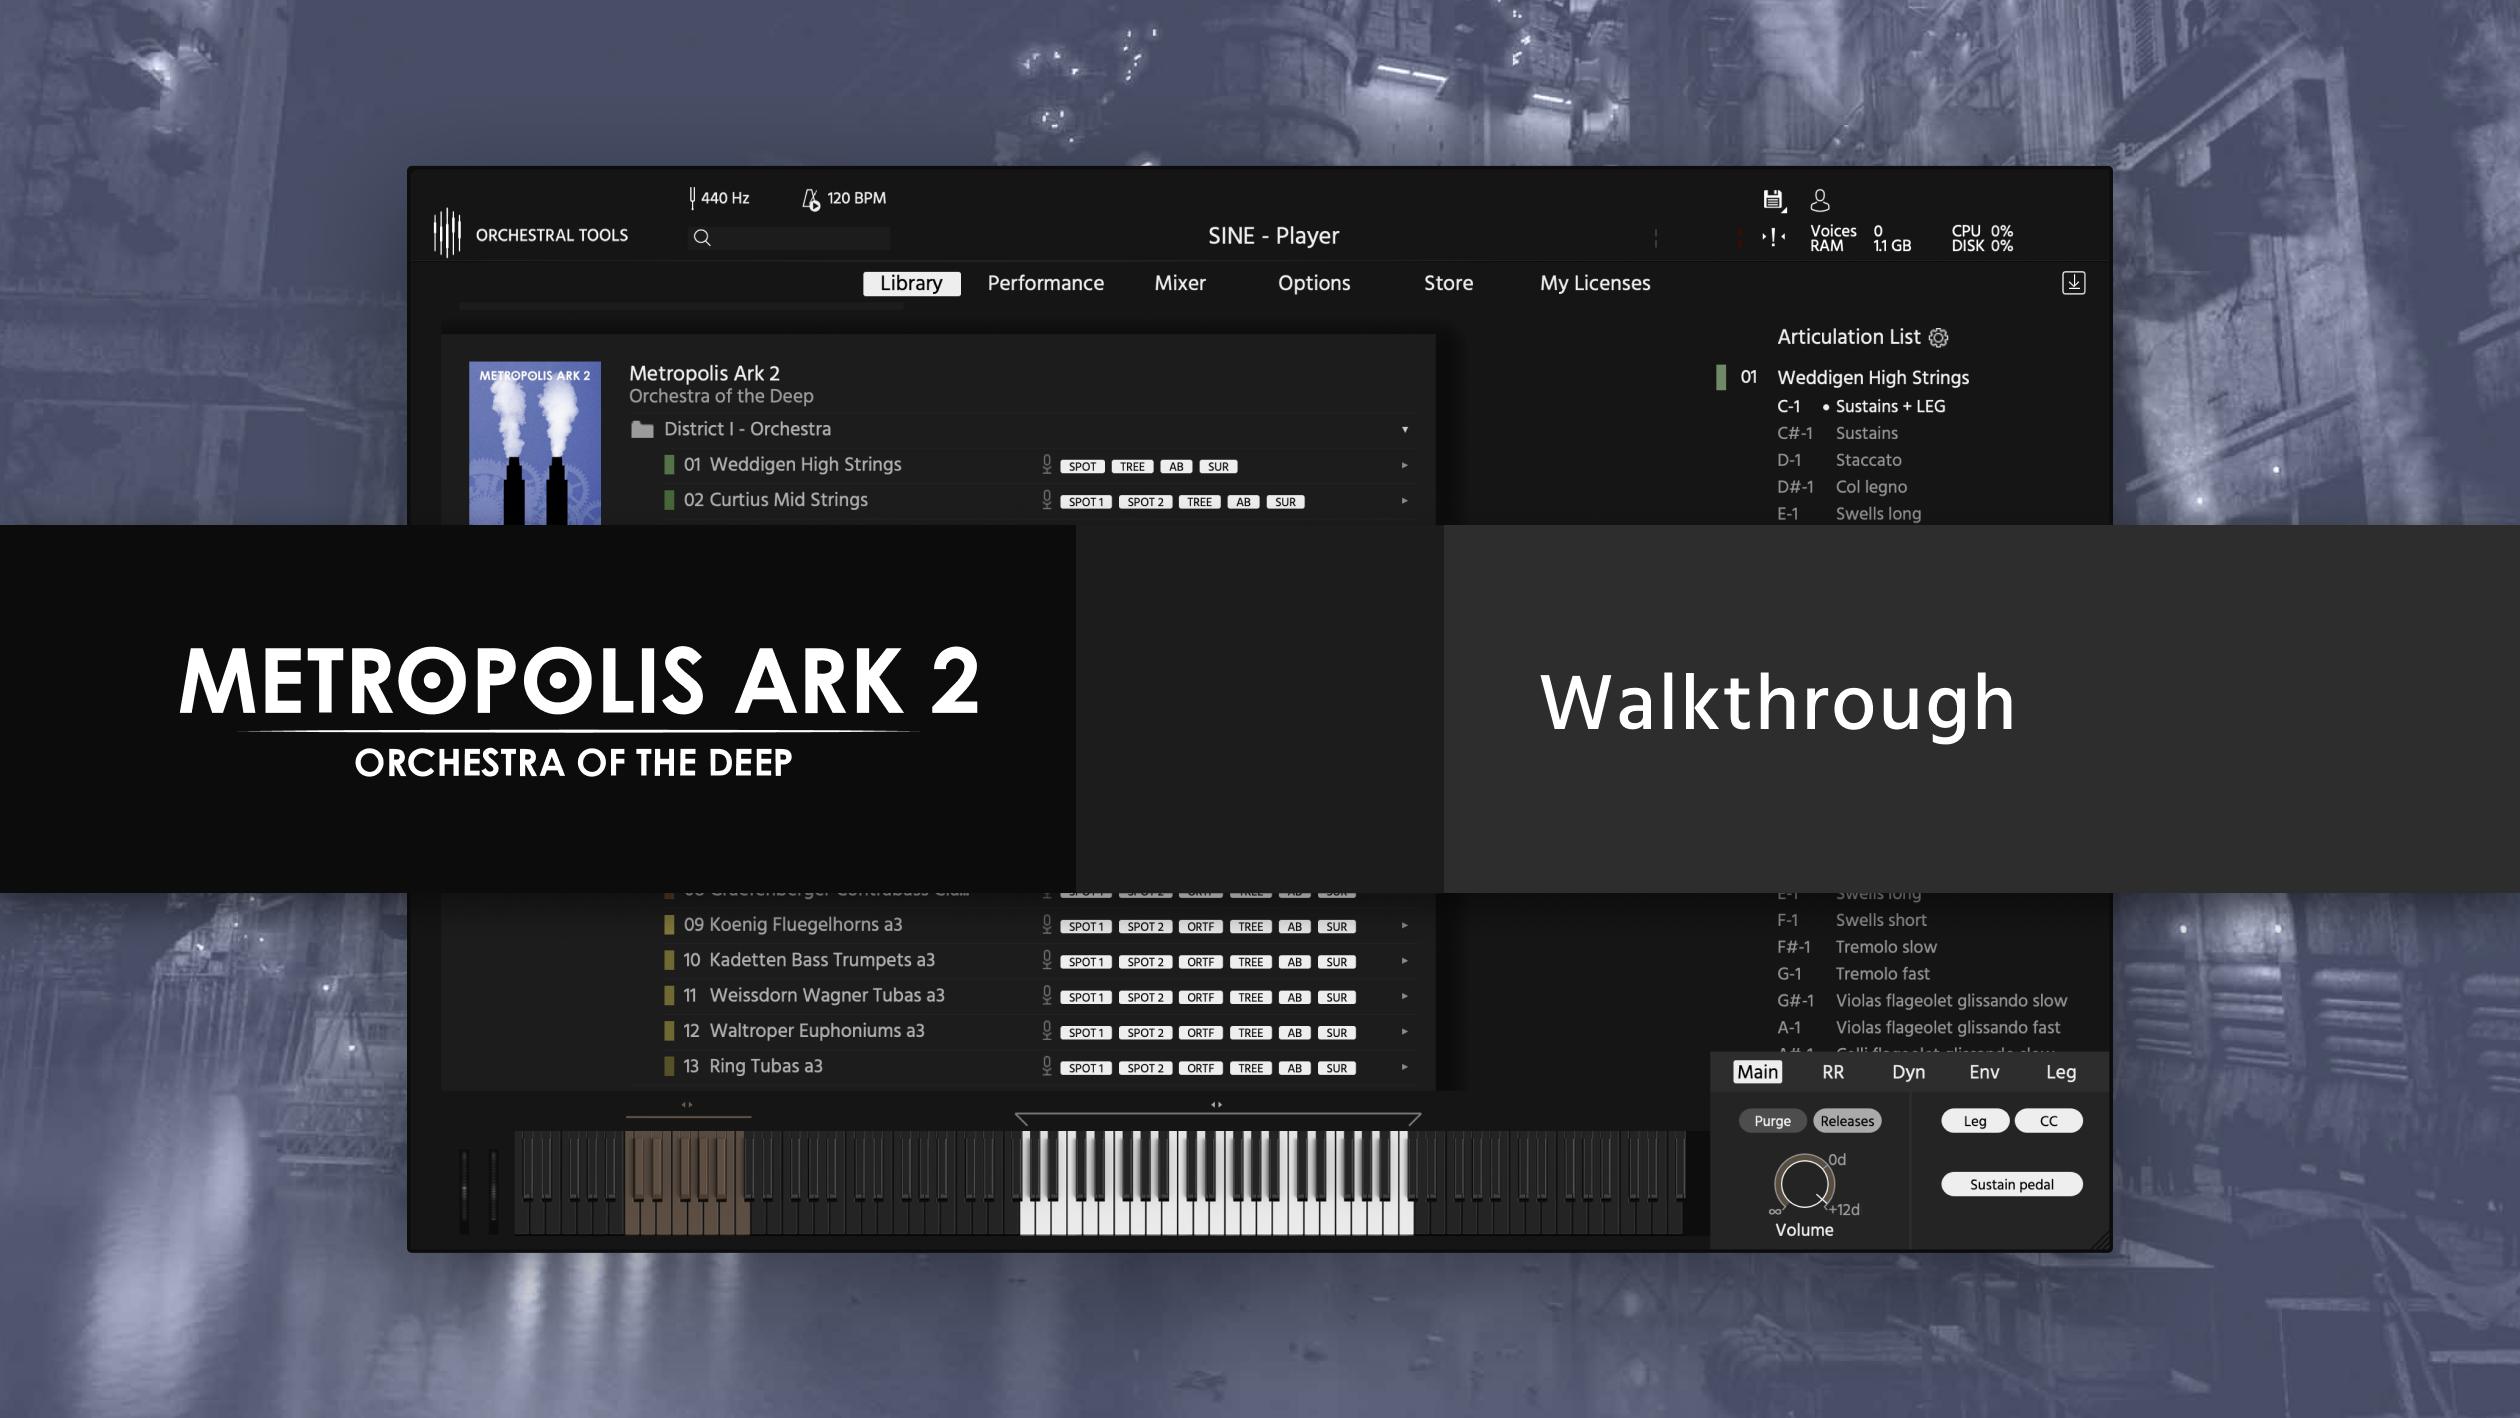 Metropolis Ark 2 SINE walkthrough